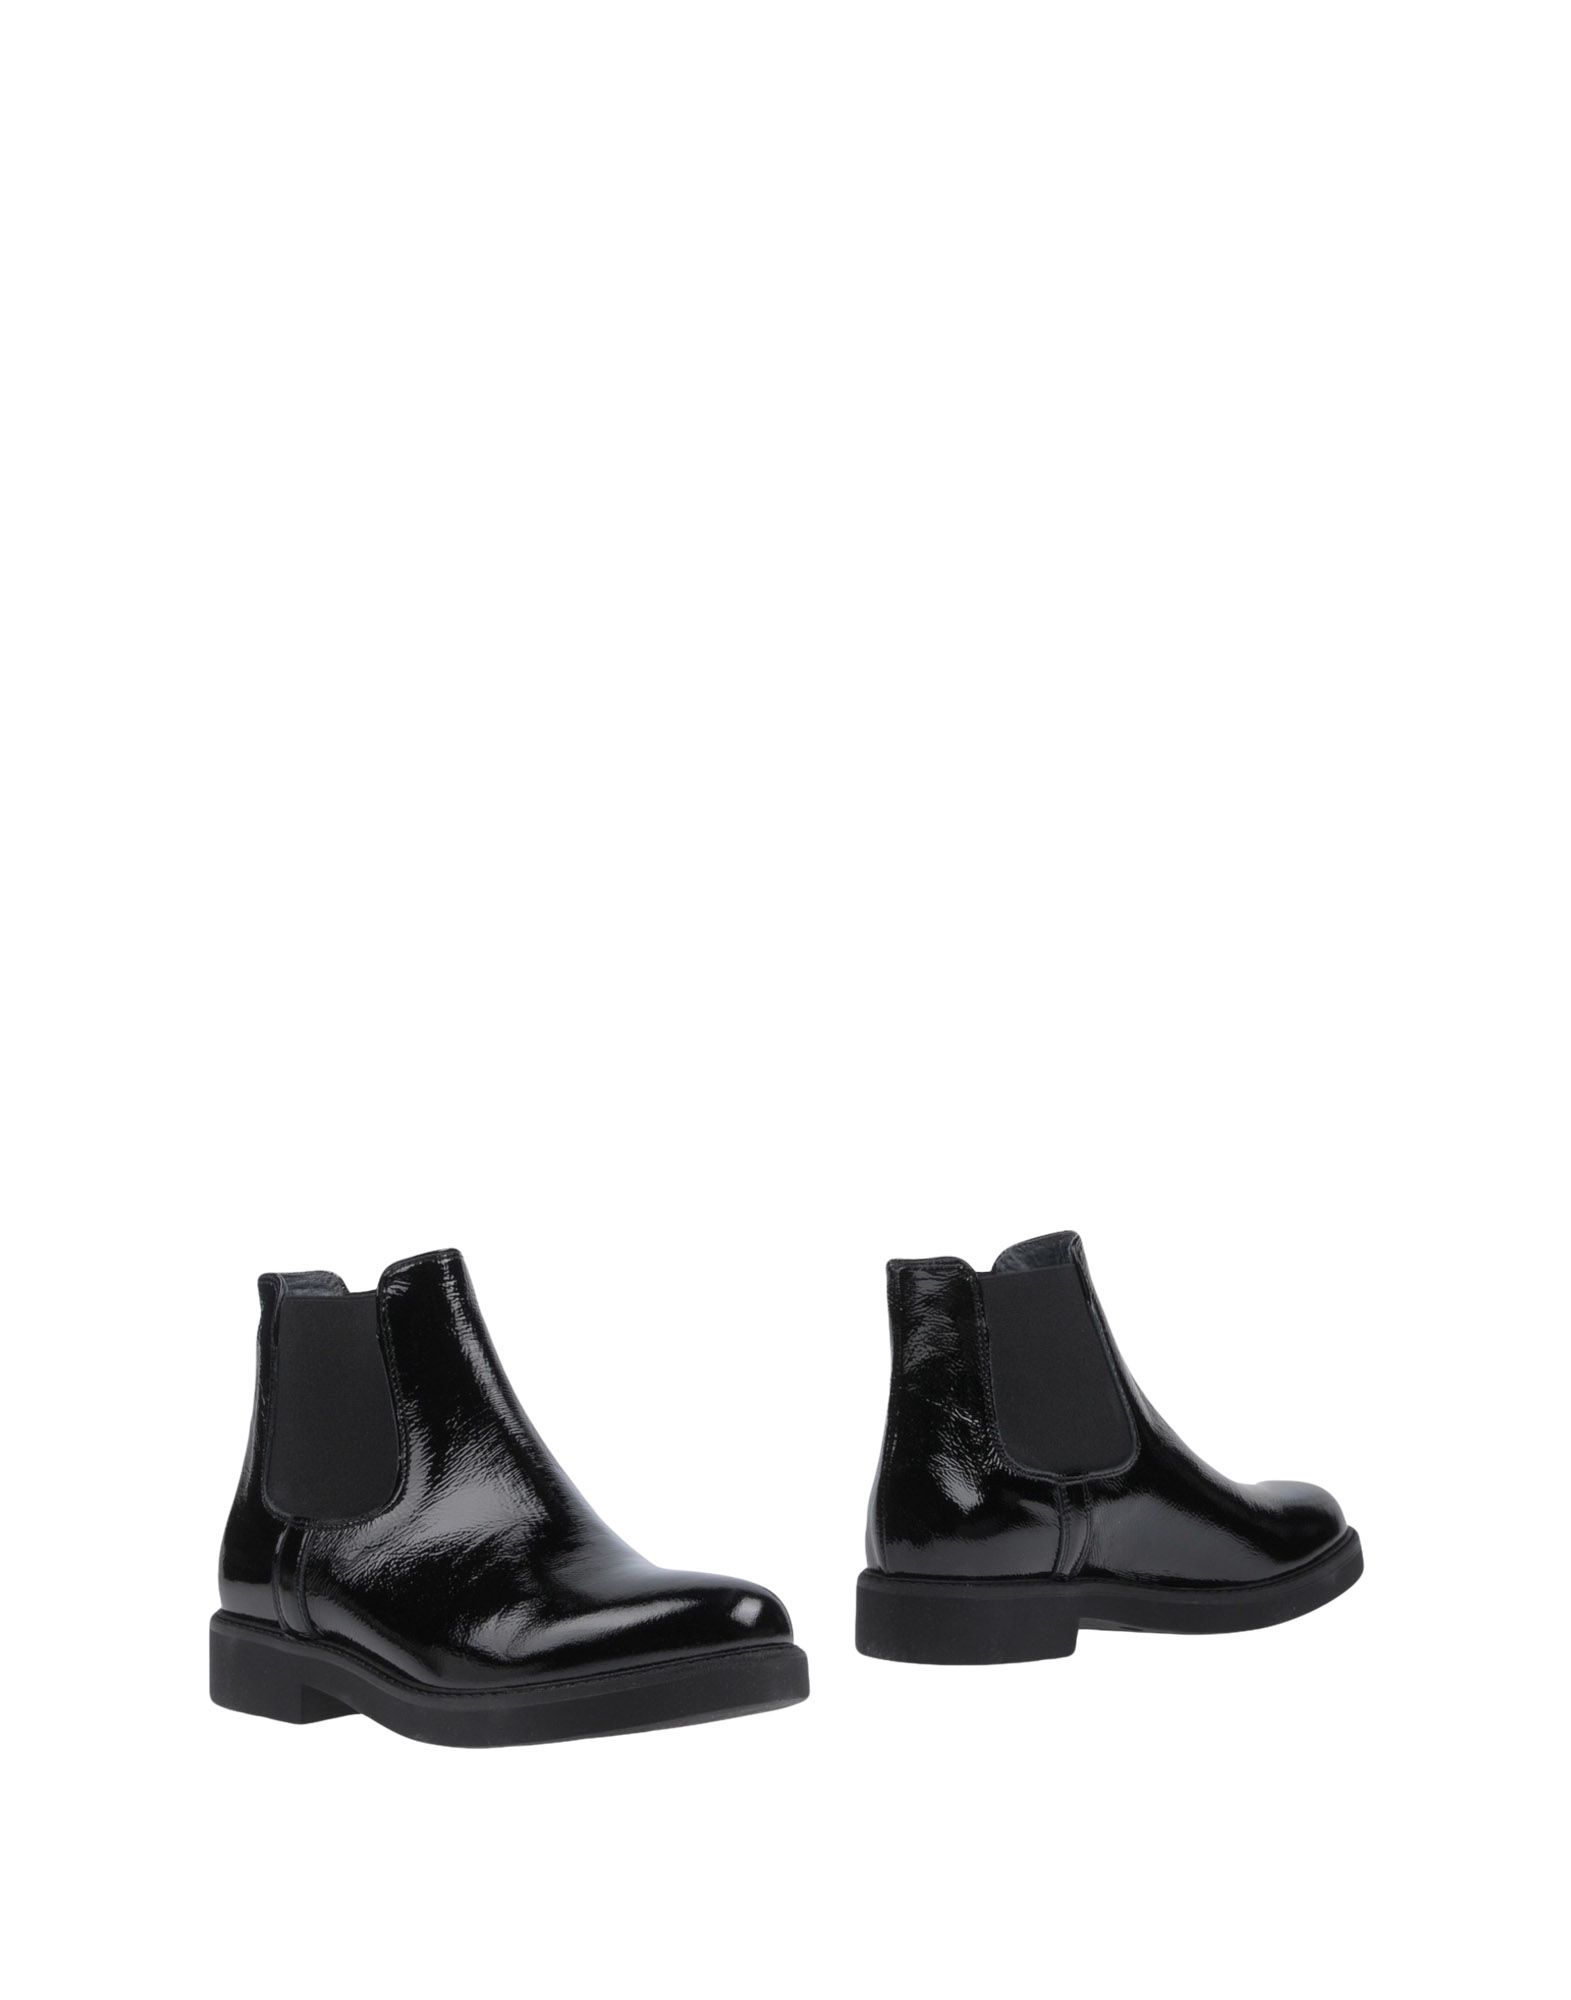 4abfdfaac2d5b6 Boots Oroscuro Donna - 11455284HO Chelsea nrrsdk6709-Nuove scarpe ...